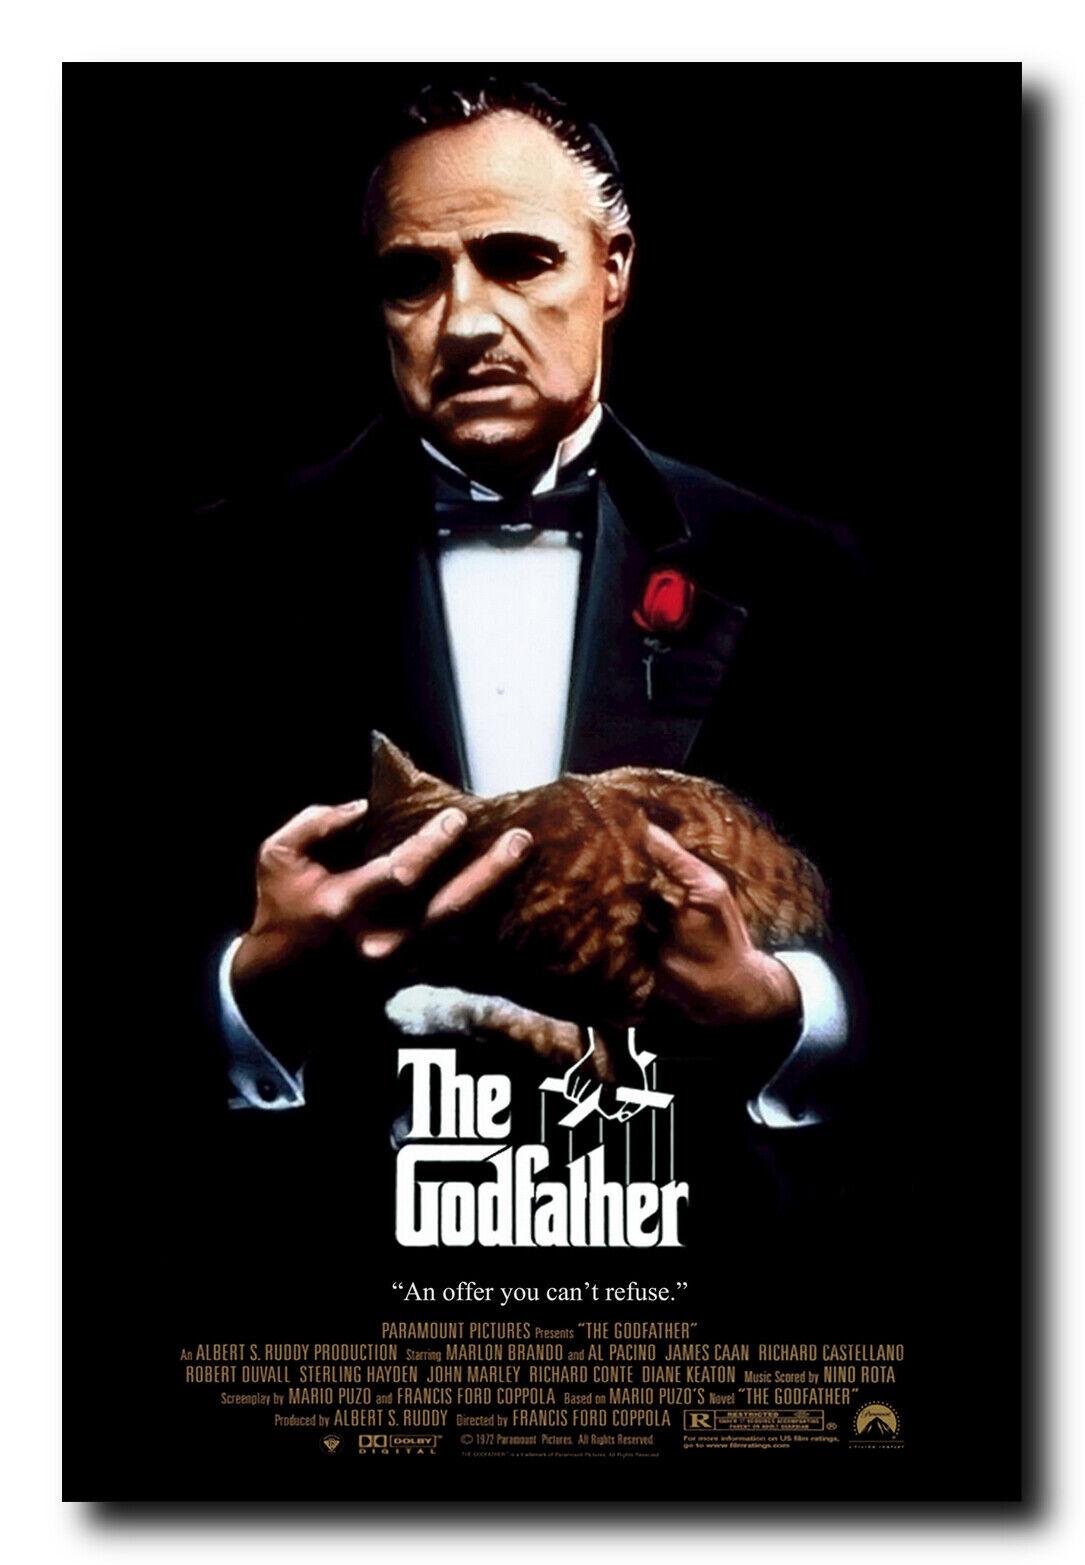 The Godfather Al Pacino Marlon Brando Classic Movie Poster 30 24x36in Y-394